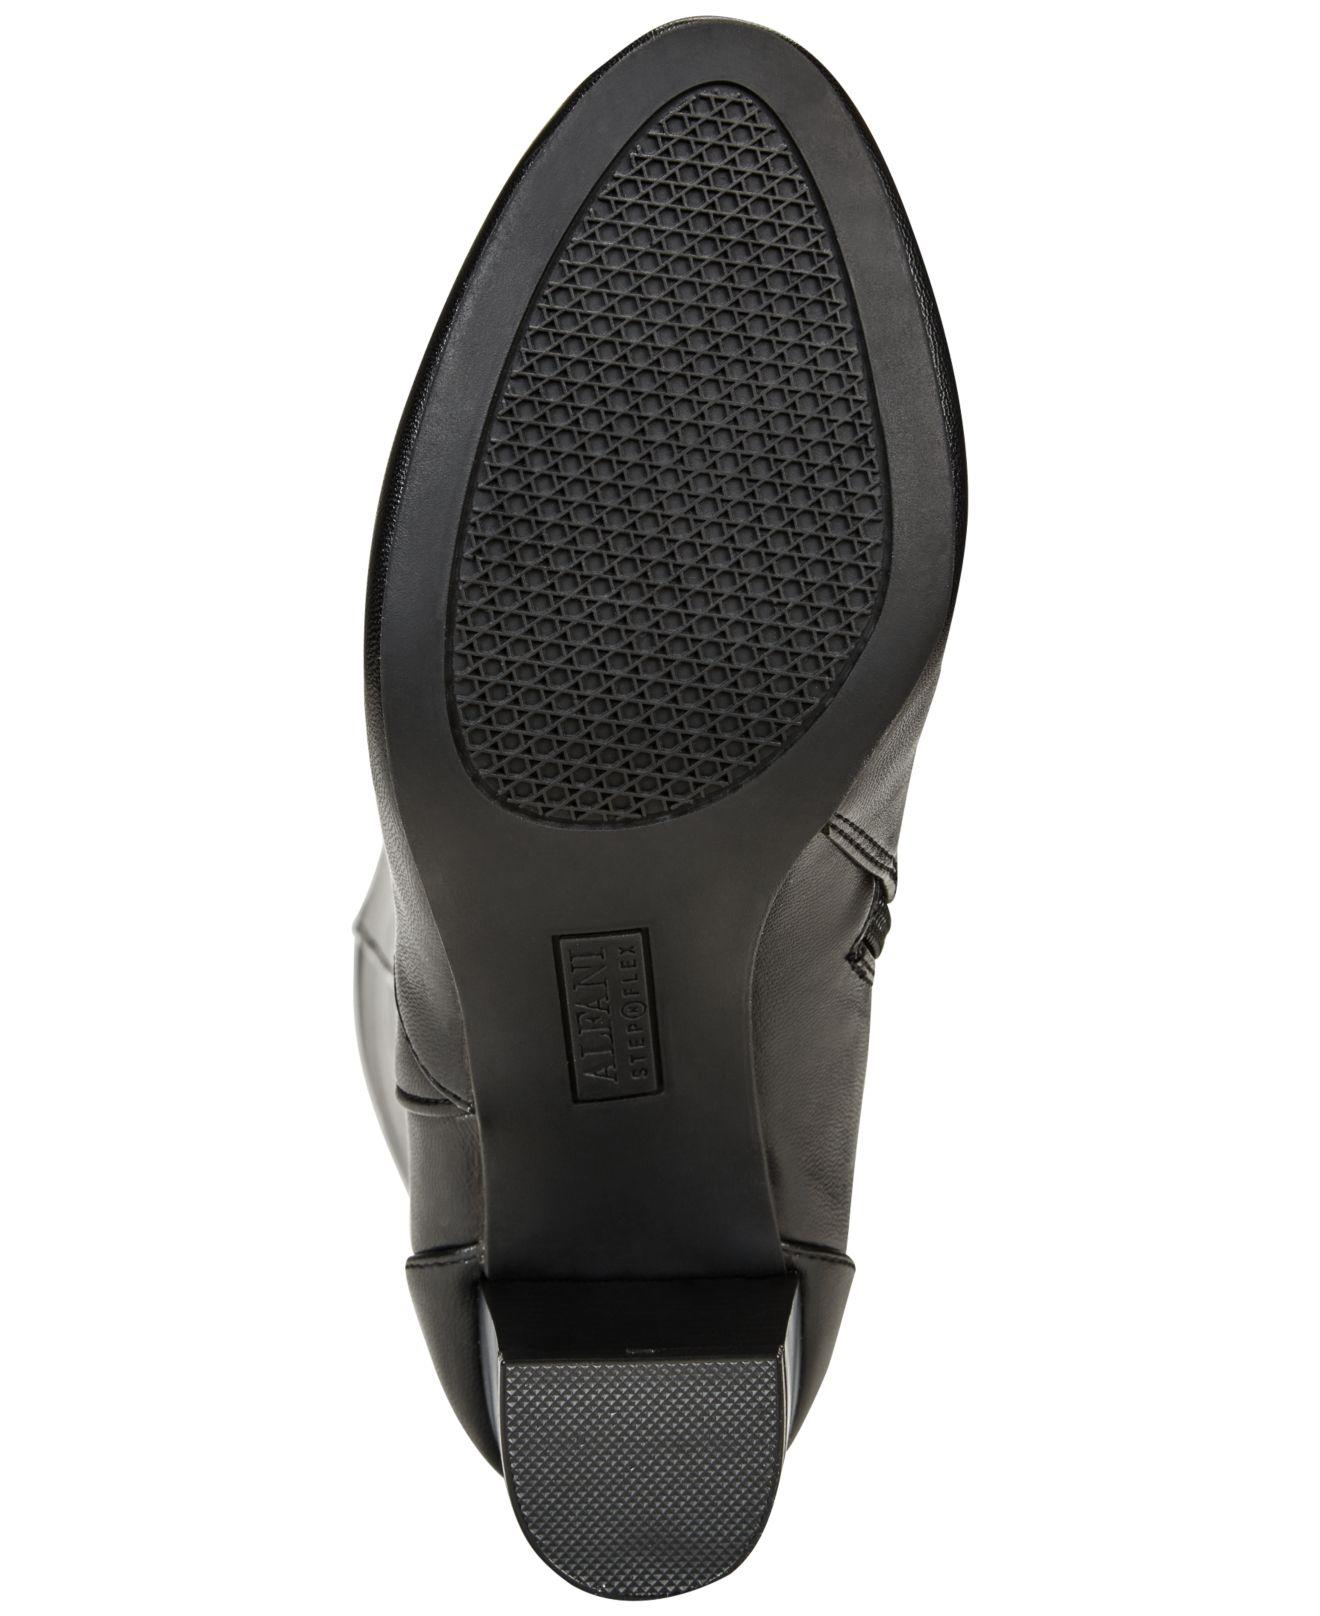 bfa10db01a0 Lyst - Alfani Giliann Wide-calf Dress Boots in Black